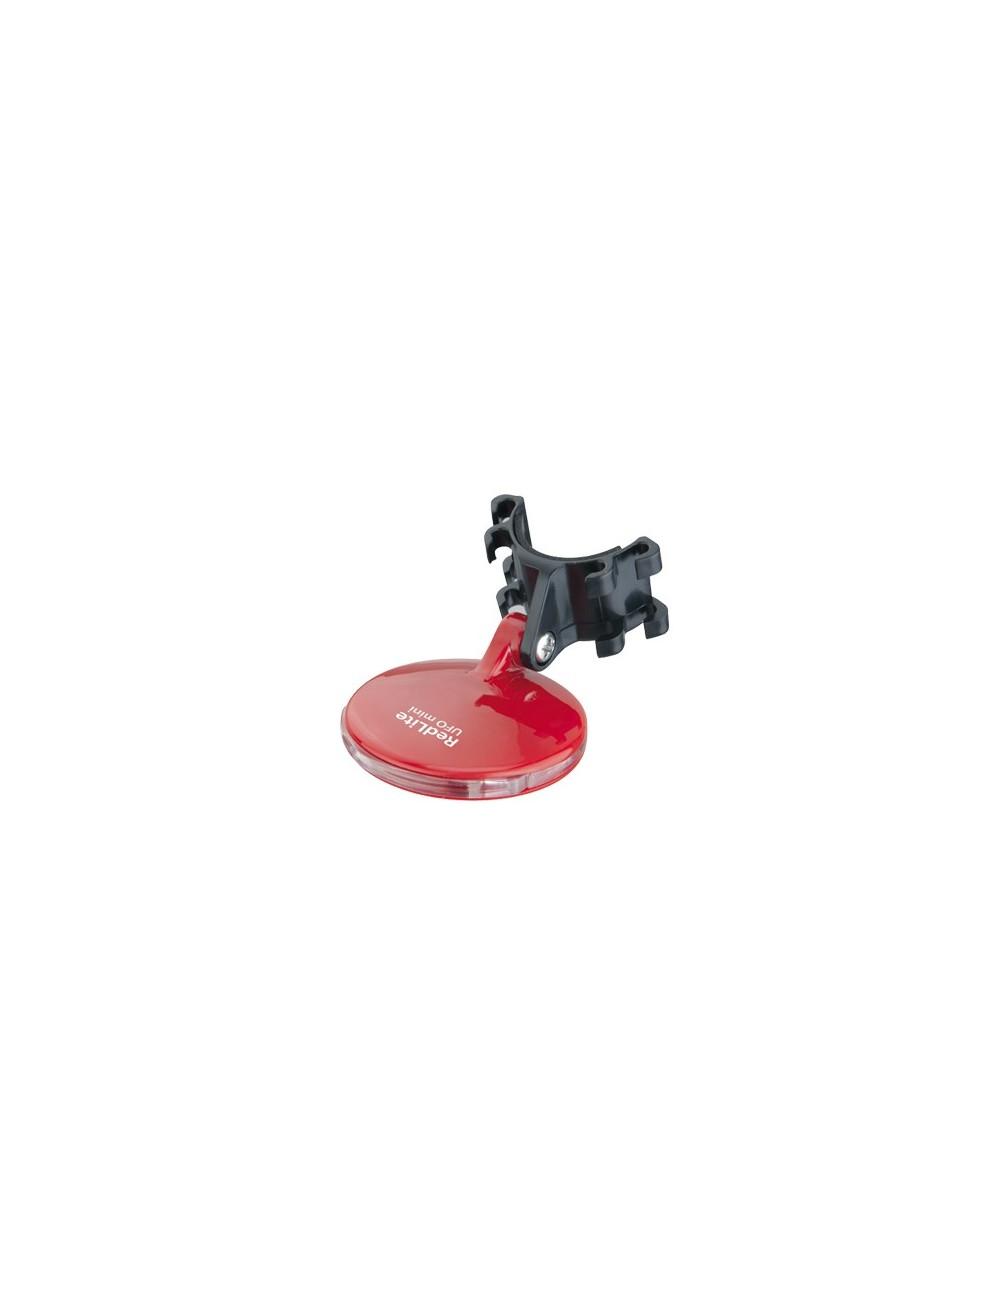 Intermitente Topeak Red Lite UFO Mini Vermelho